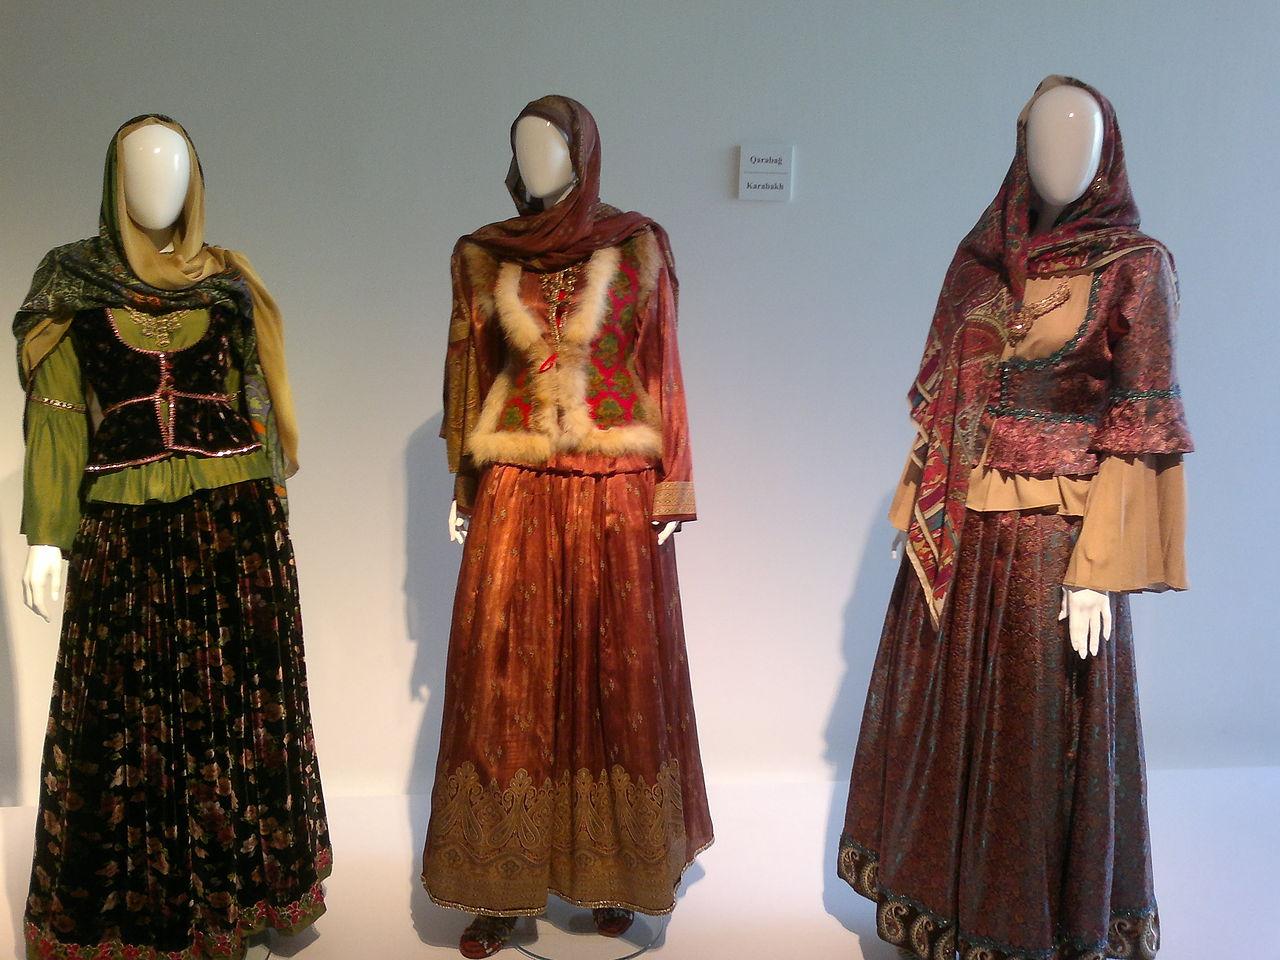 Центр Гейдара Алиева, национальные костюмы